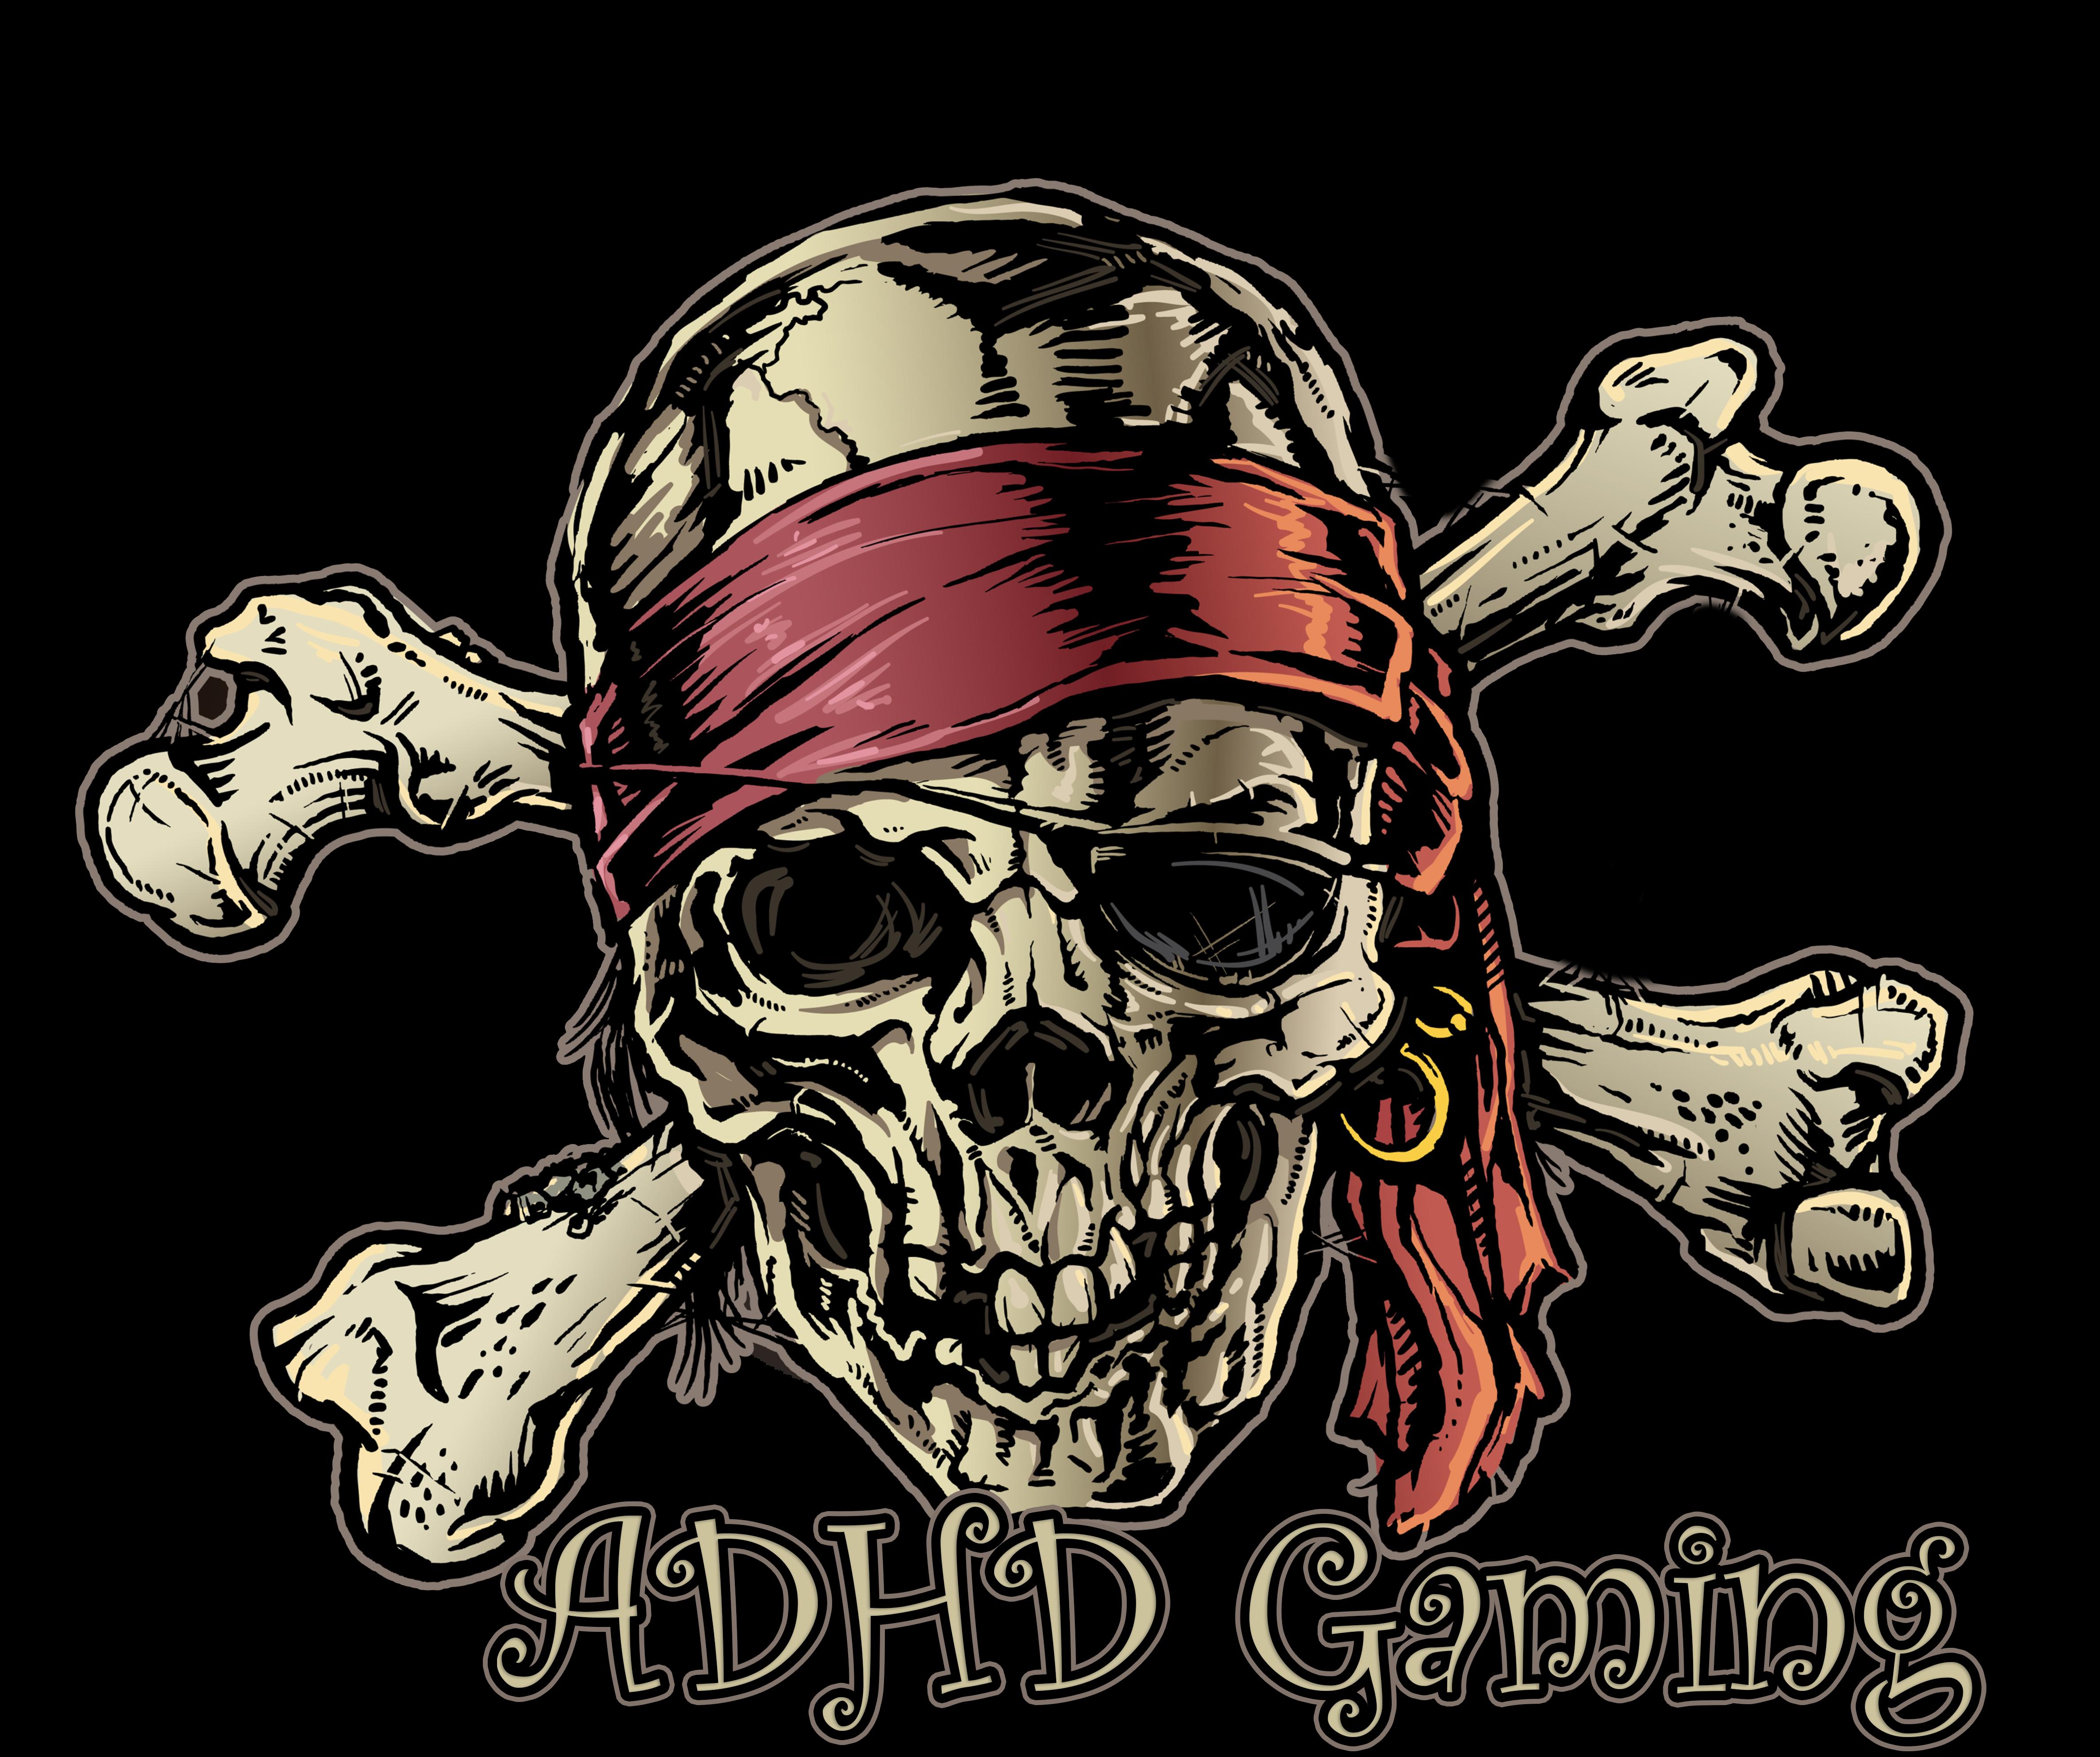 Atlas-pirate-ADHD